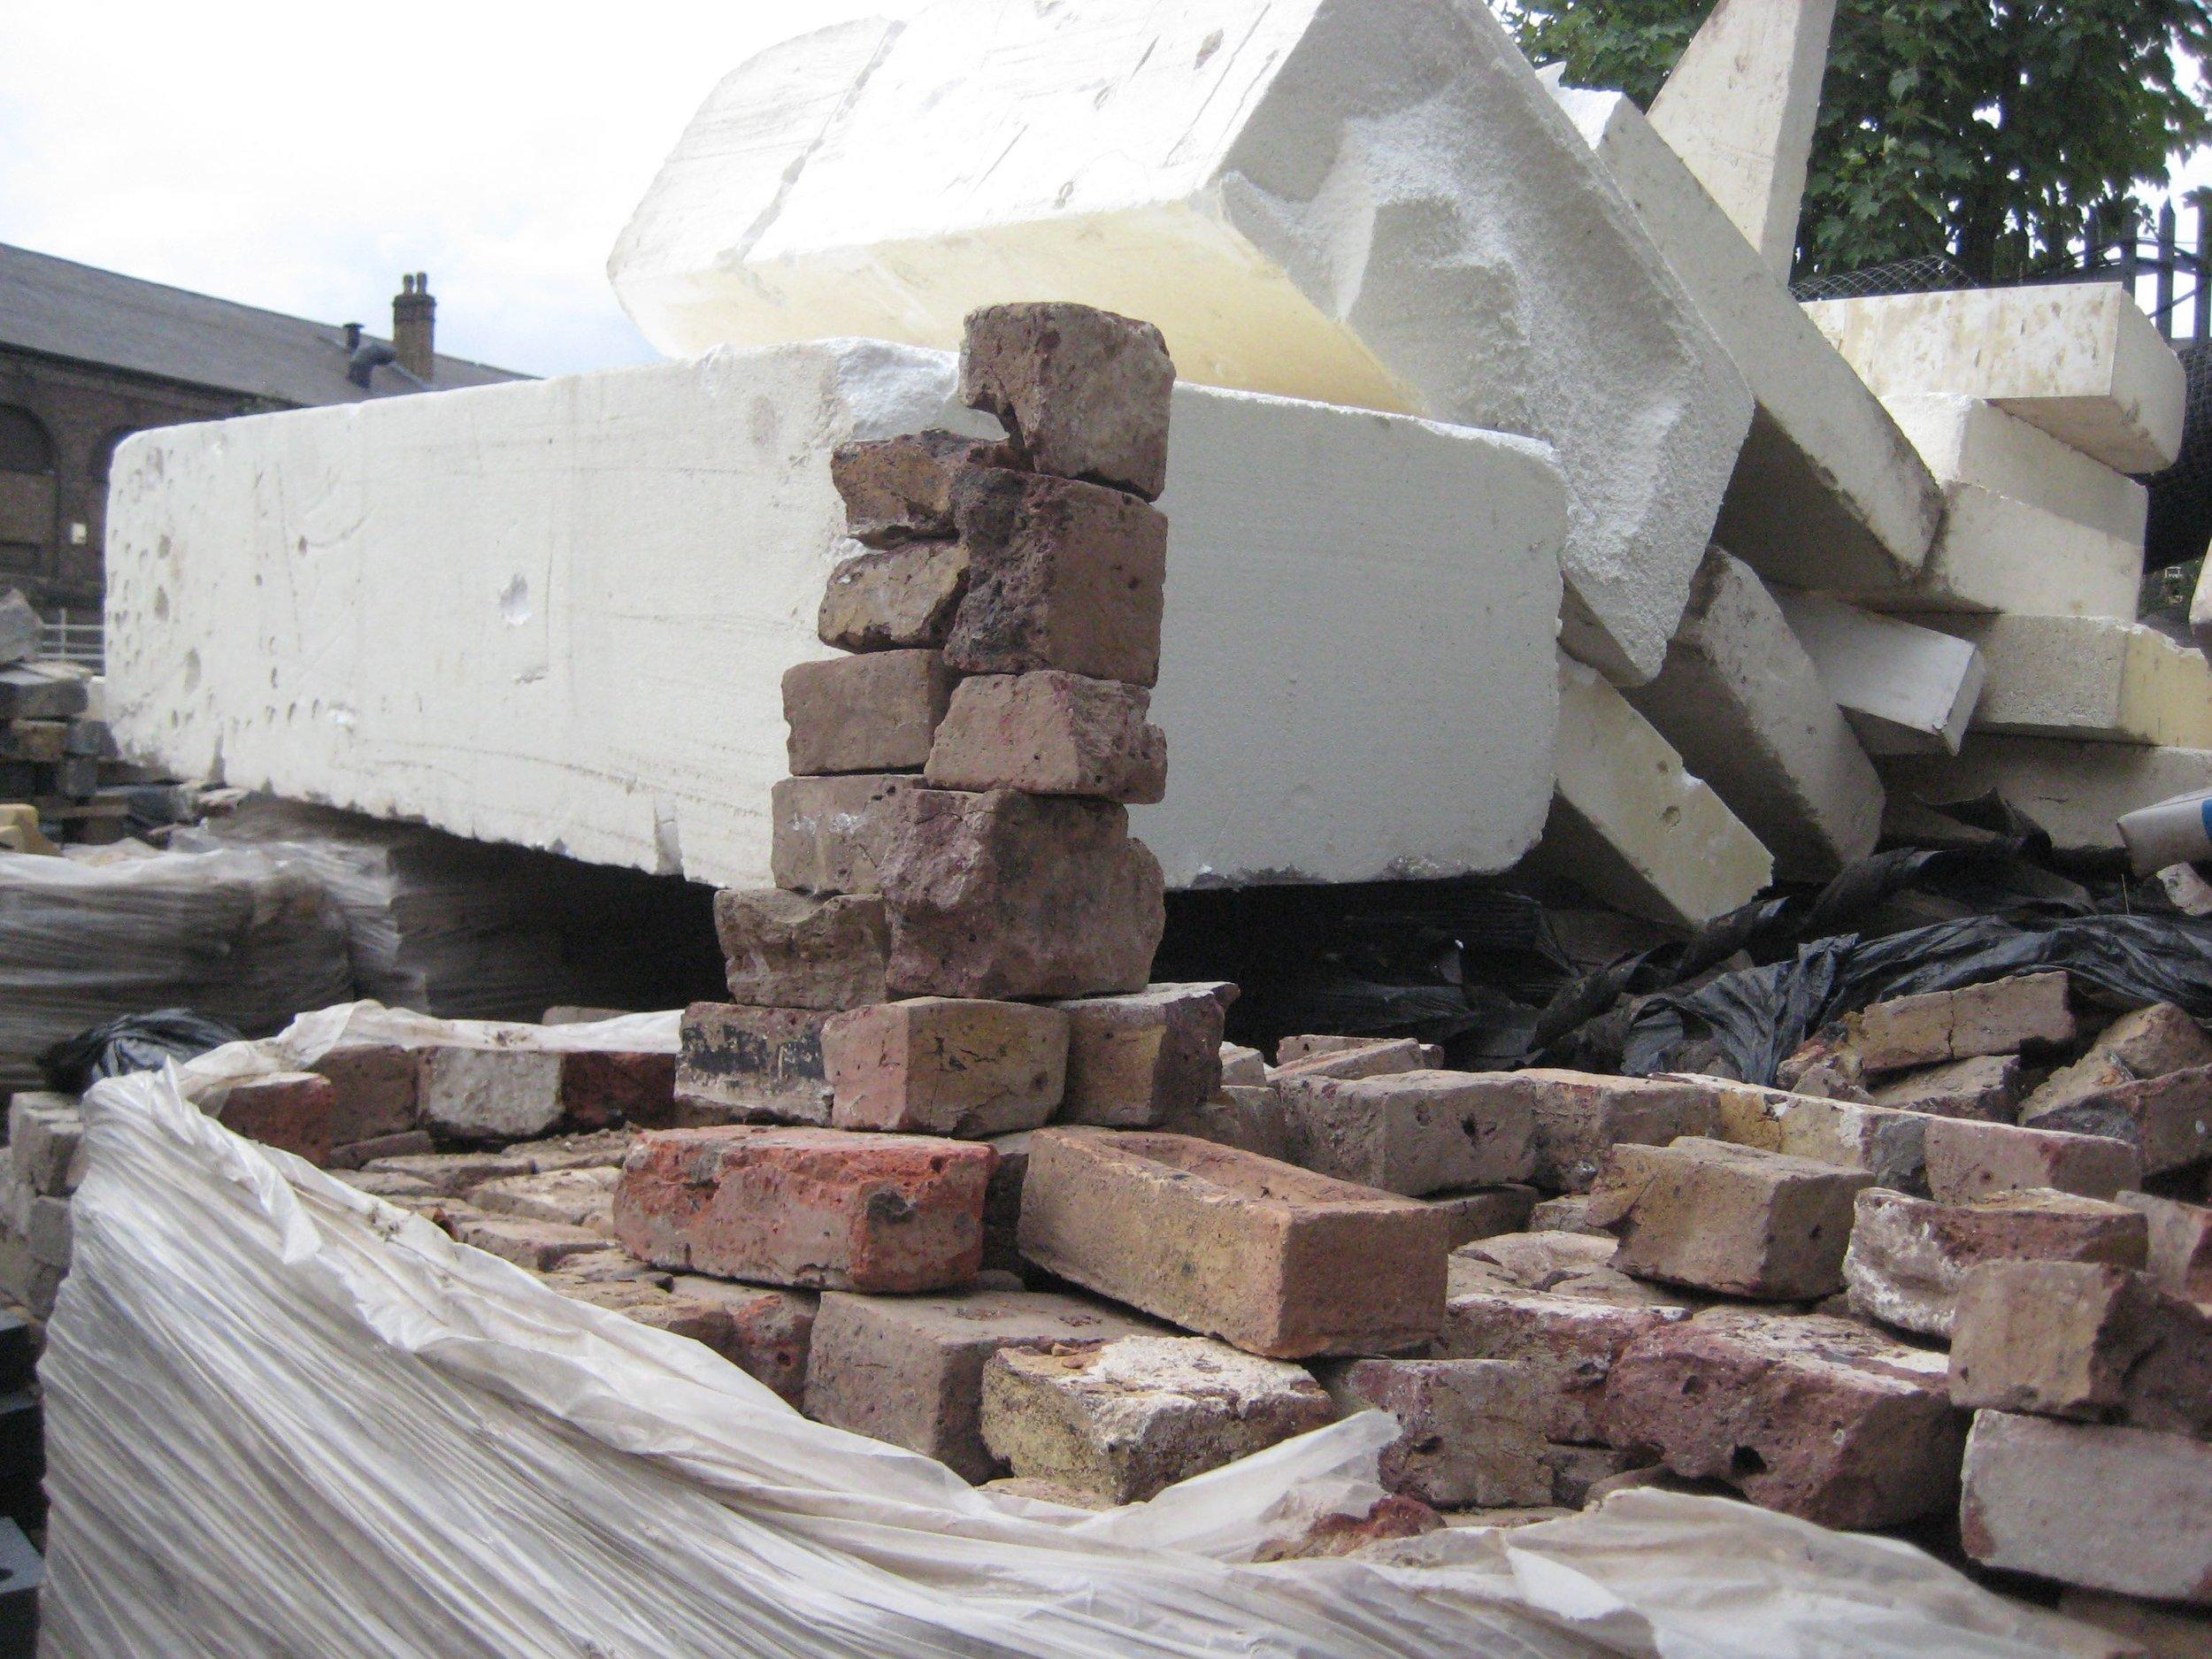 CLXX Stacked bricks_unstacked blocks.jpg